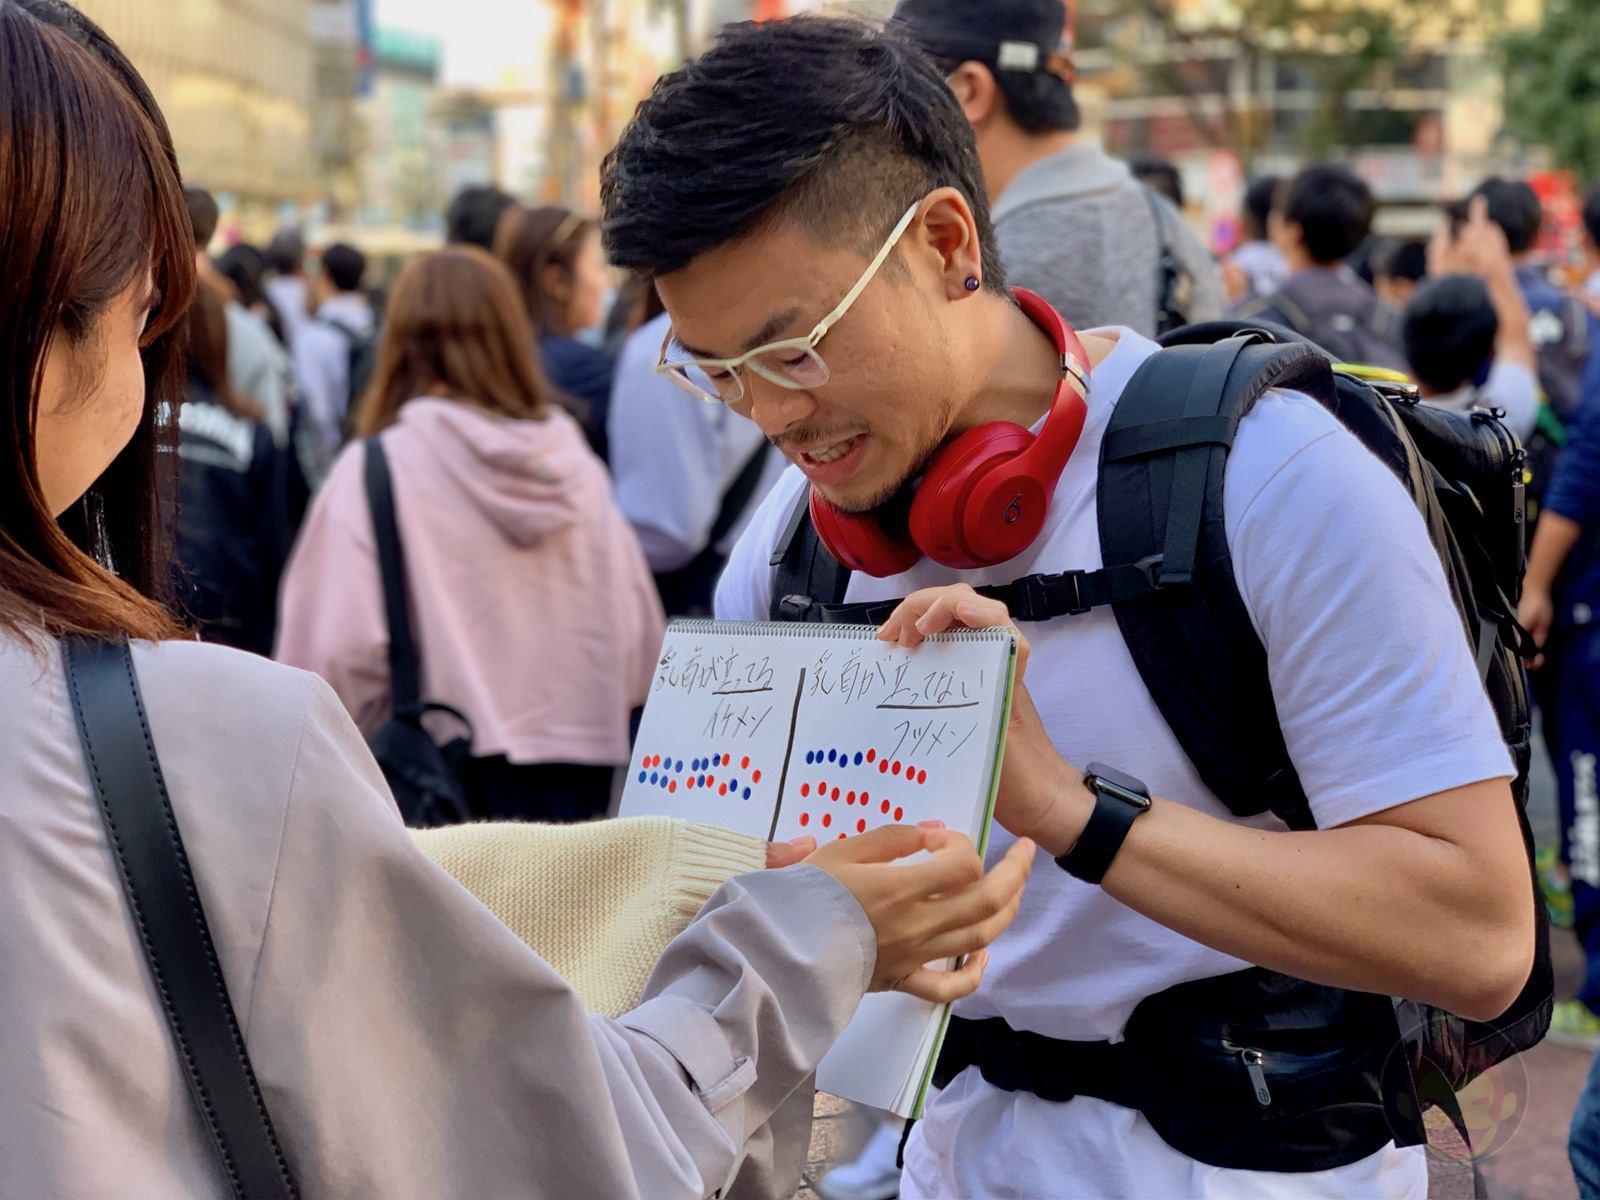 White-Tshirt-Questionare-at-Shibuya-Harajuku-25.jpg